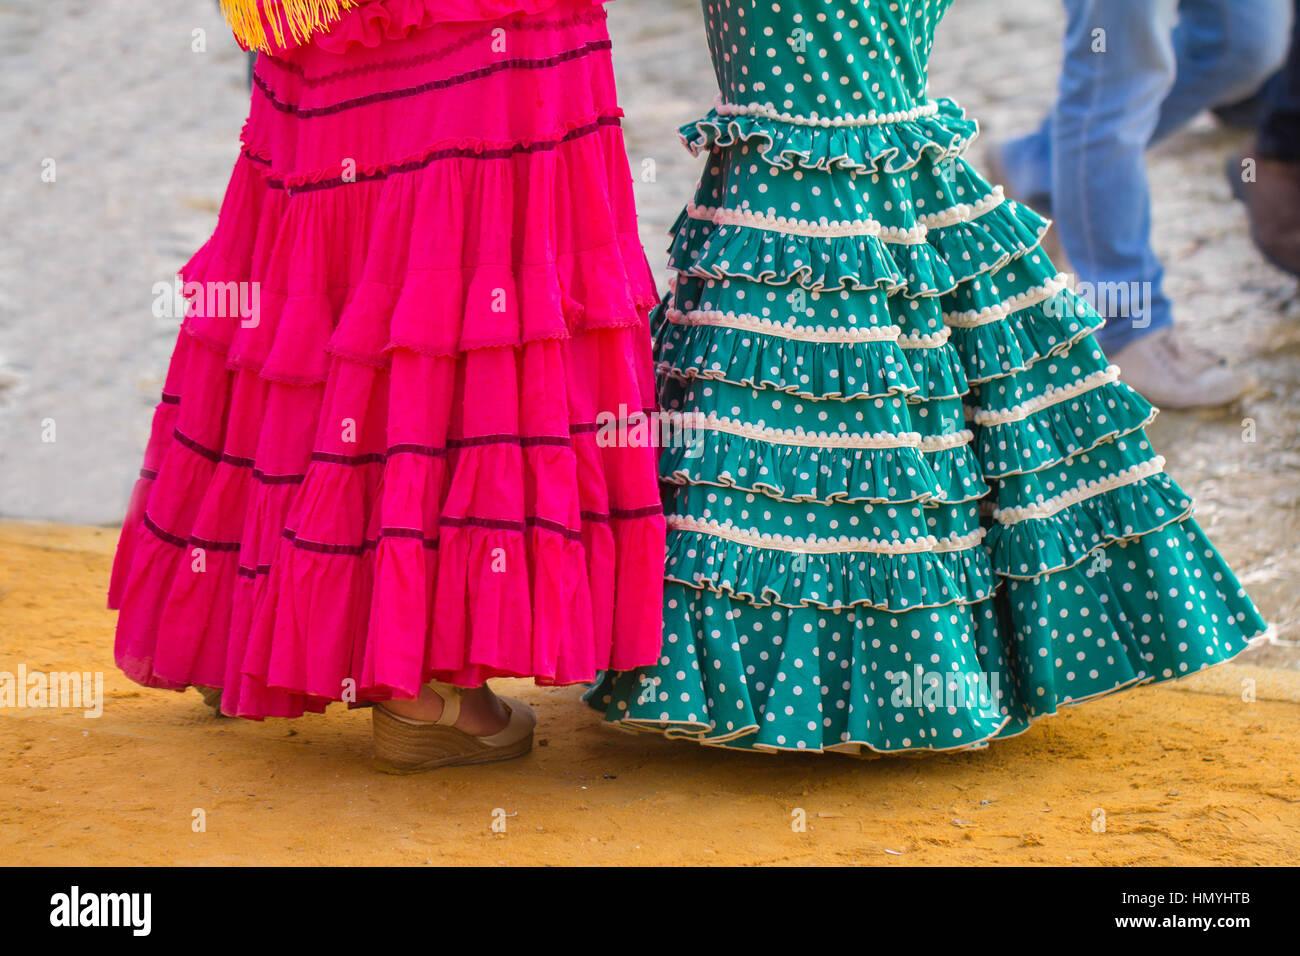 Femme robe flamenco Photo Stock